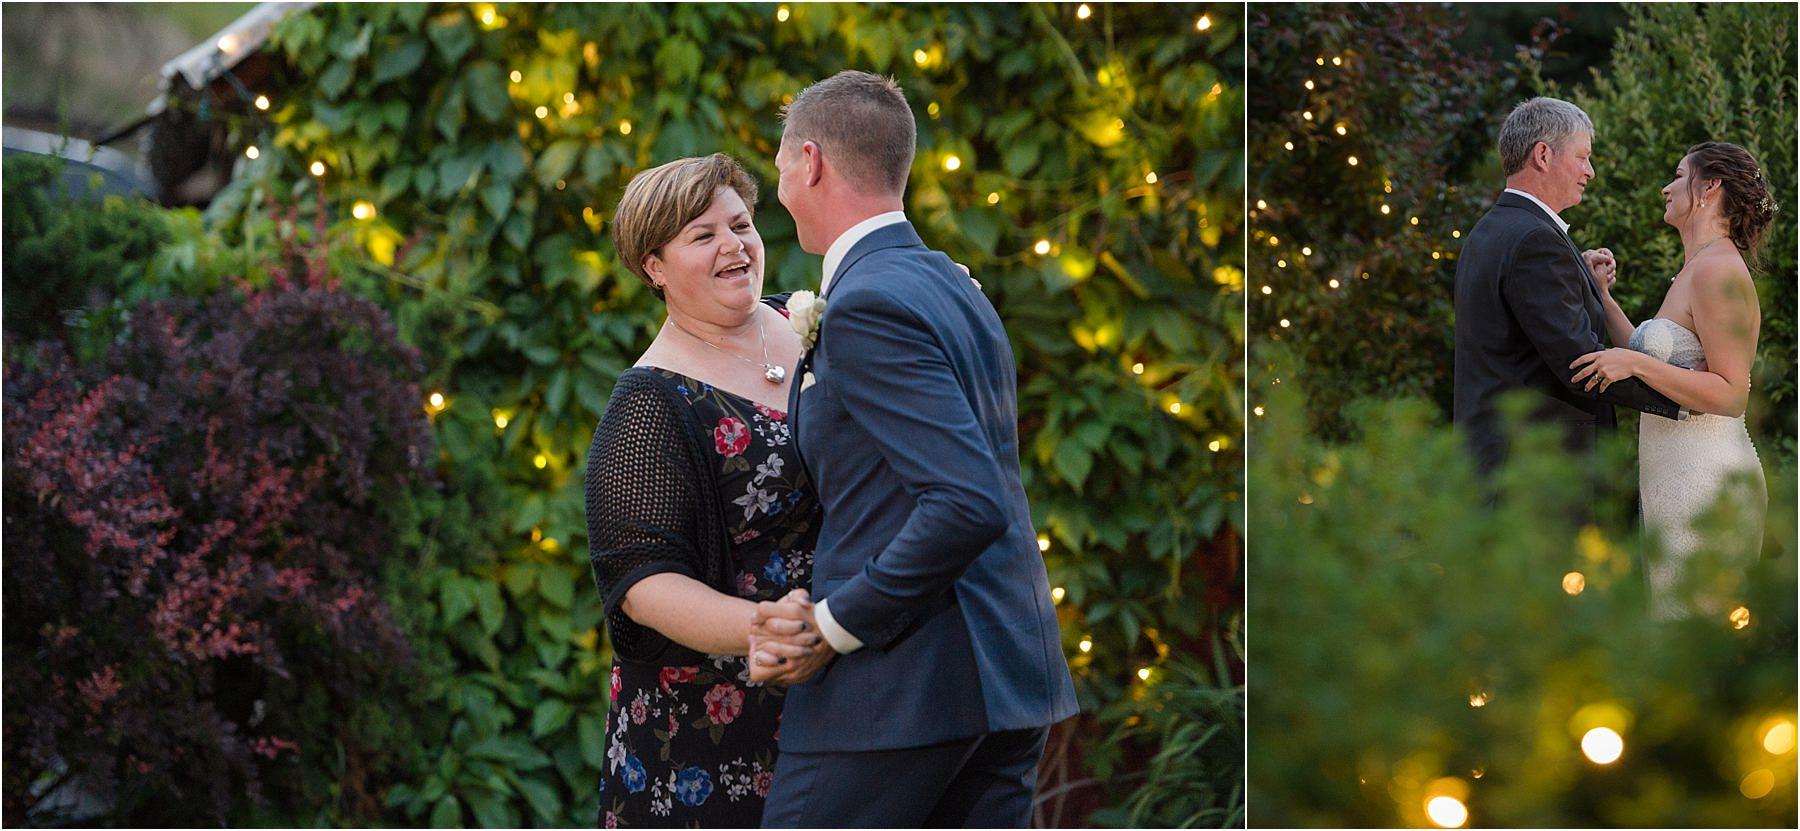 Kamloops wedding photographer reception venue ideas first dance parent dances twinkle lights evergreen garden